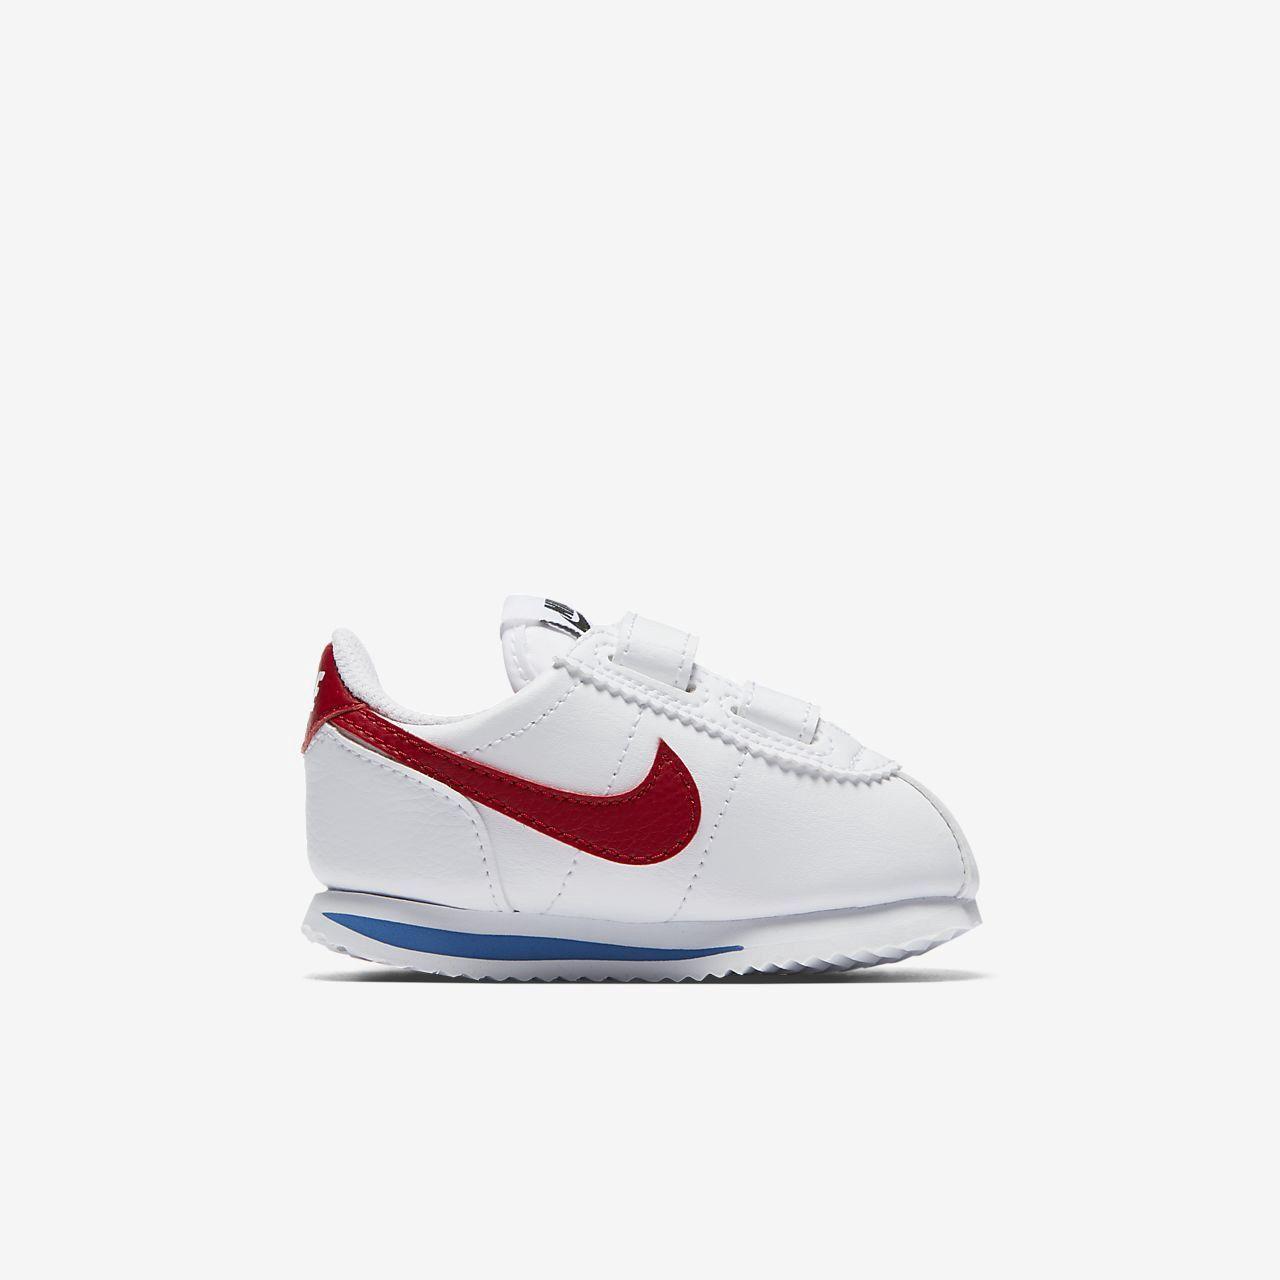 37fd5c3b9 Nike Cortez Basic Sl Infant/Toddler Shoe - 5C Red | Products